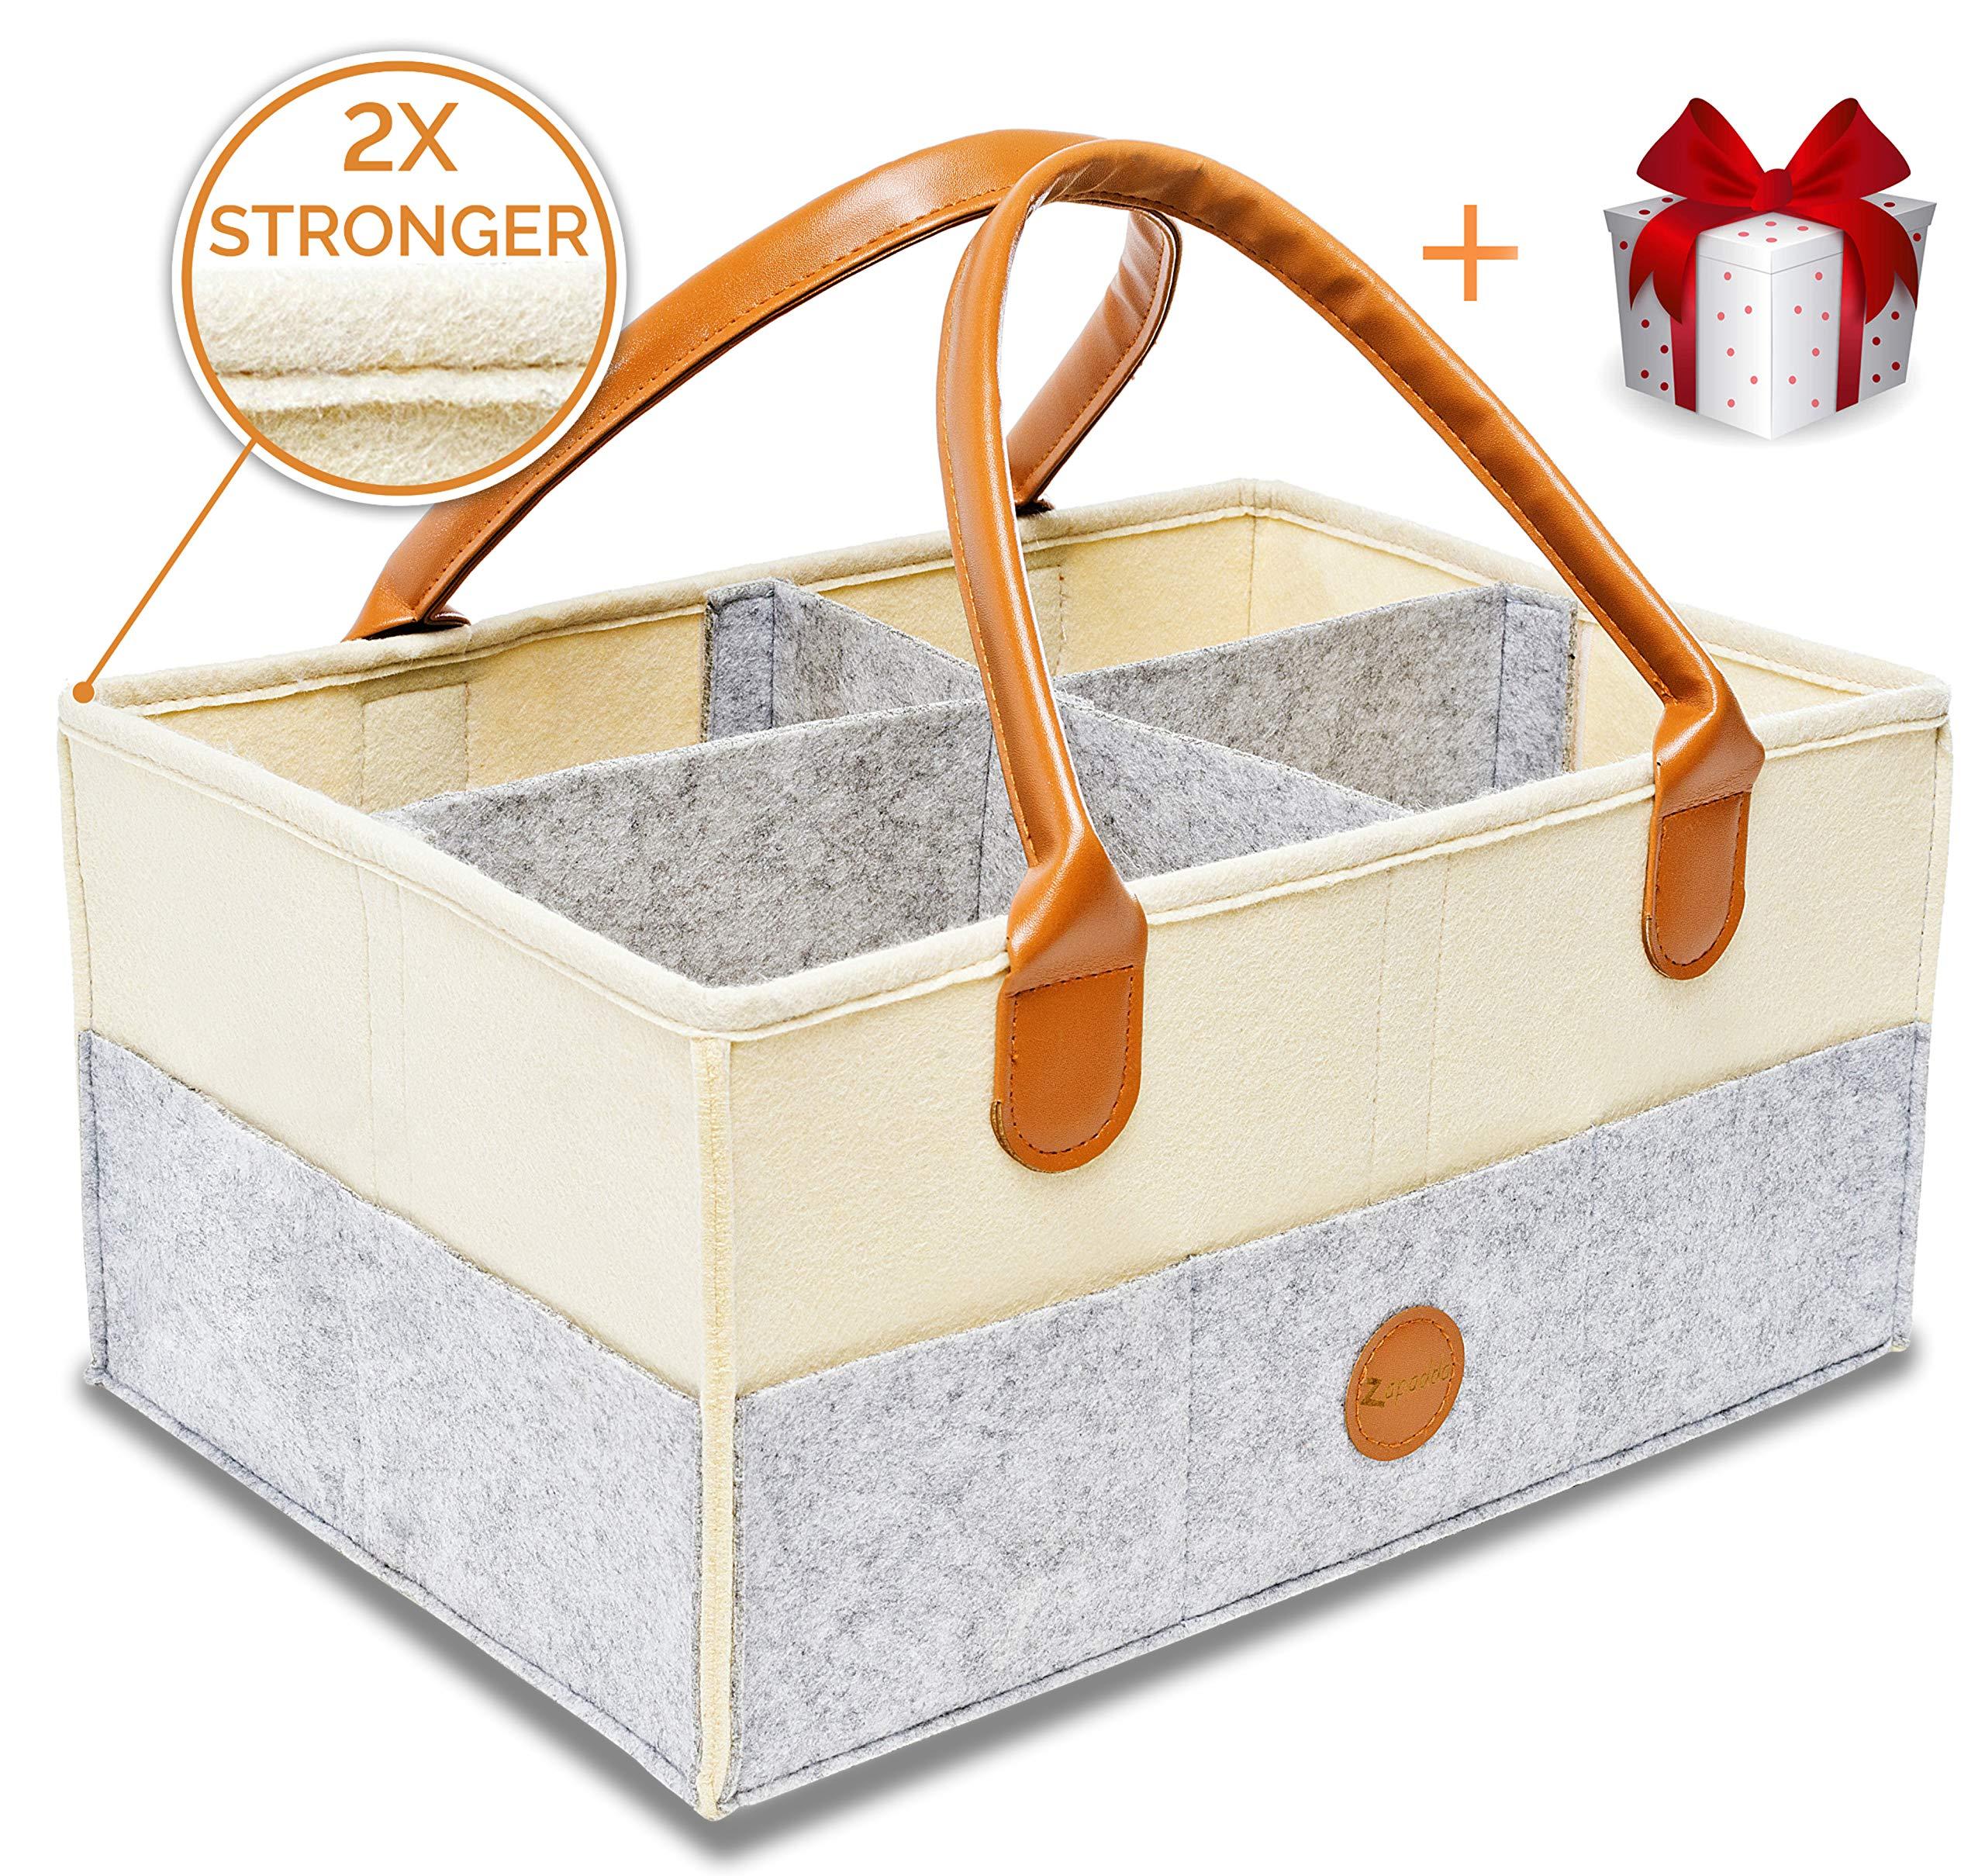 Baby Diaper Caddy Organizer | Nursery Storage Bin | Sturdy Diaper Caddy Storage Bin for Changing Table | Baby Shower Gift Basket Boys Girls | Newborn Registry Must Have | Large Portable Car Travel Bag